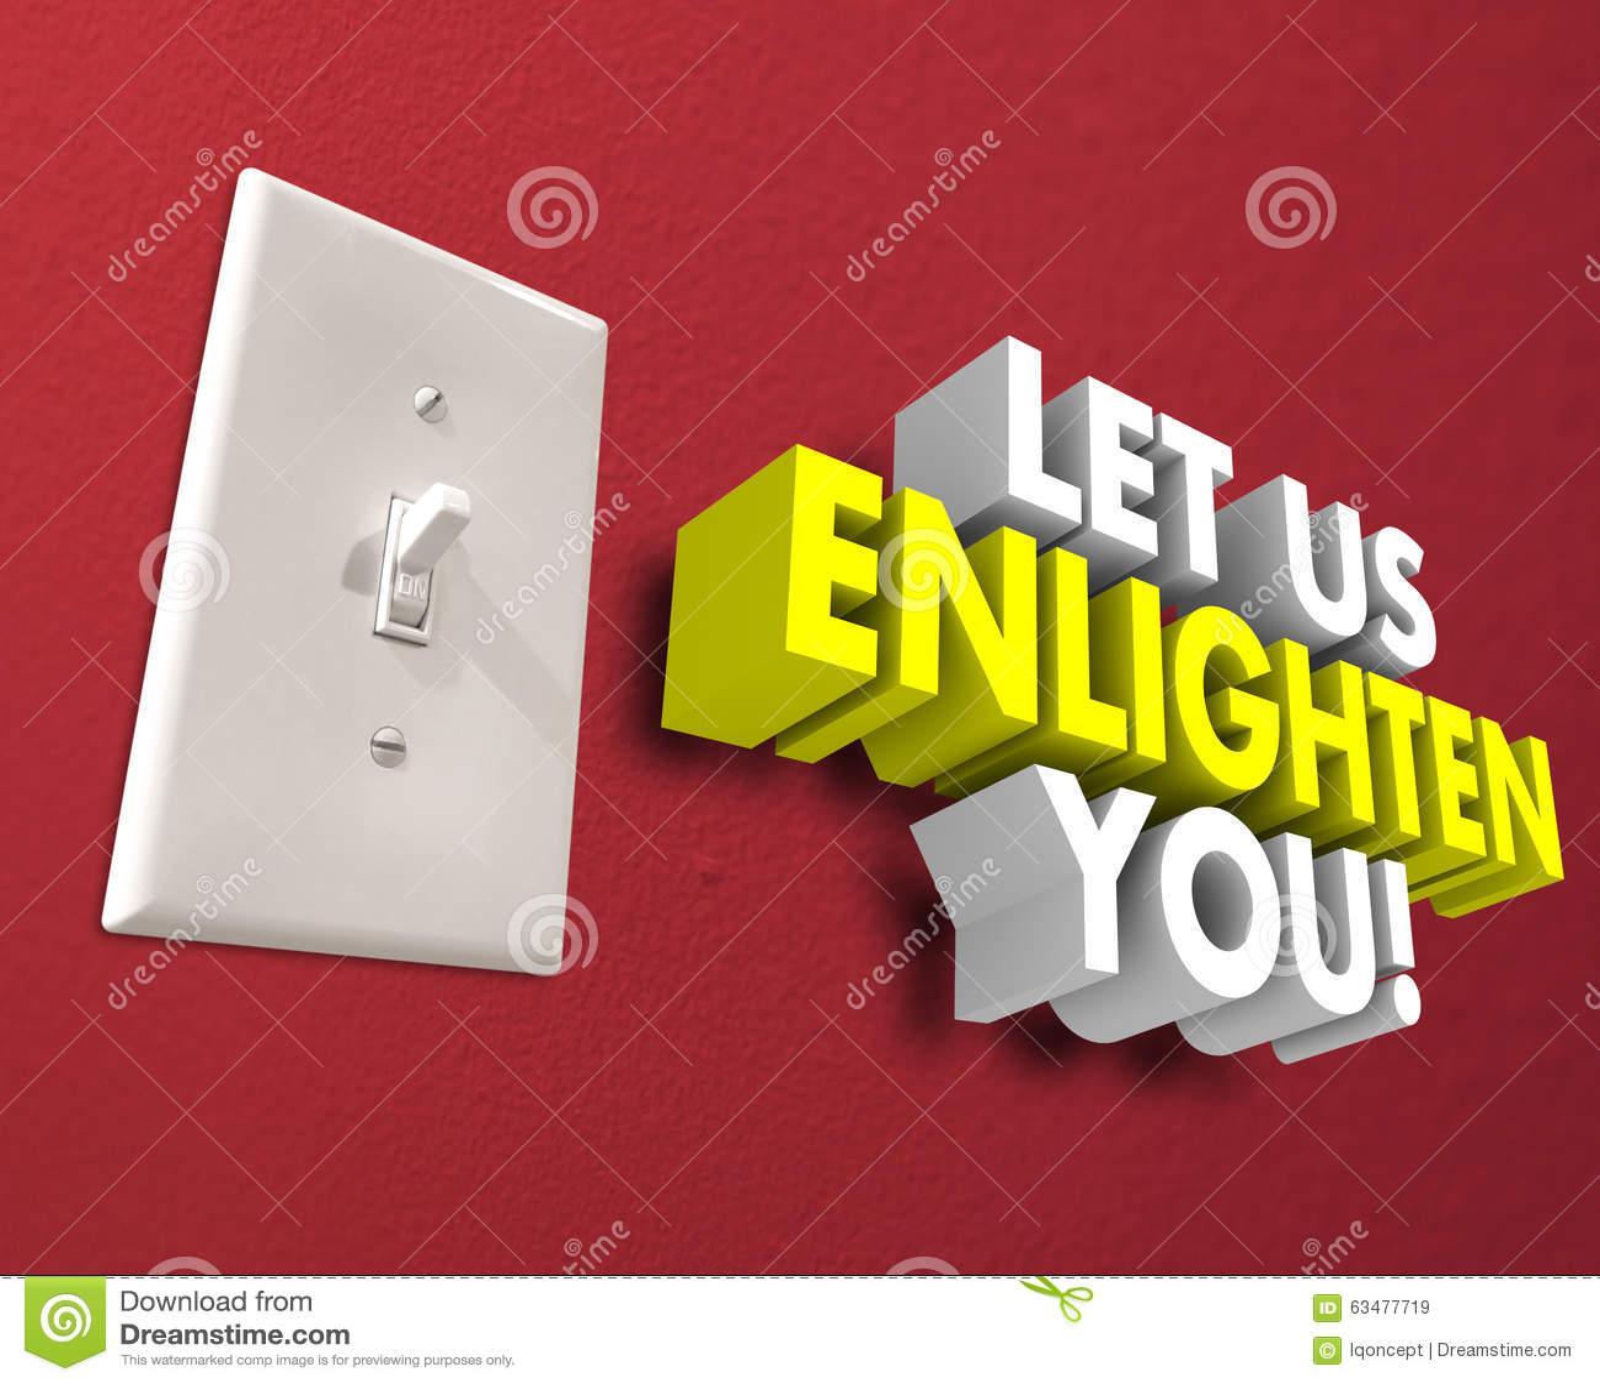 Let Us Enlighten You Light Switch Sharing Teaching Information